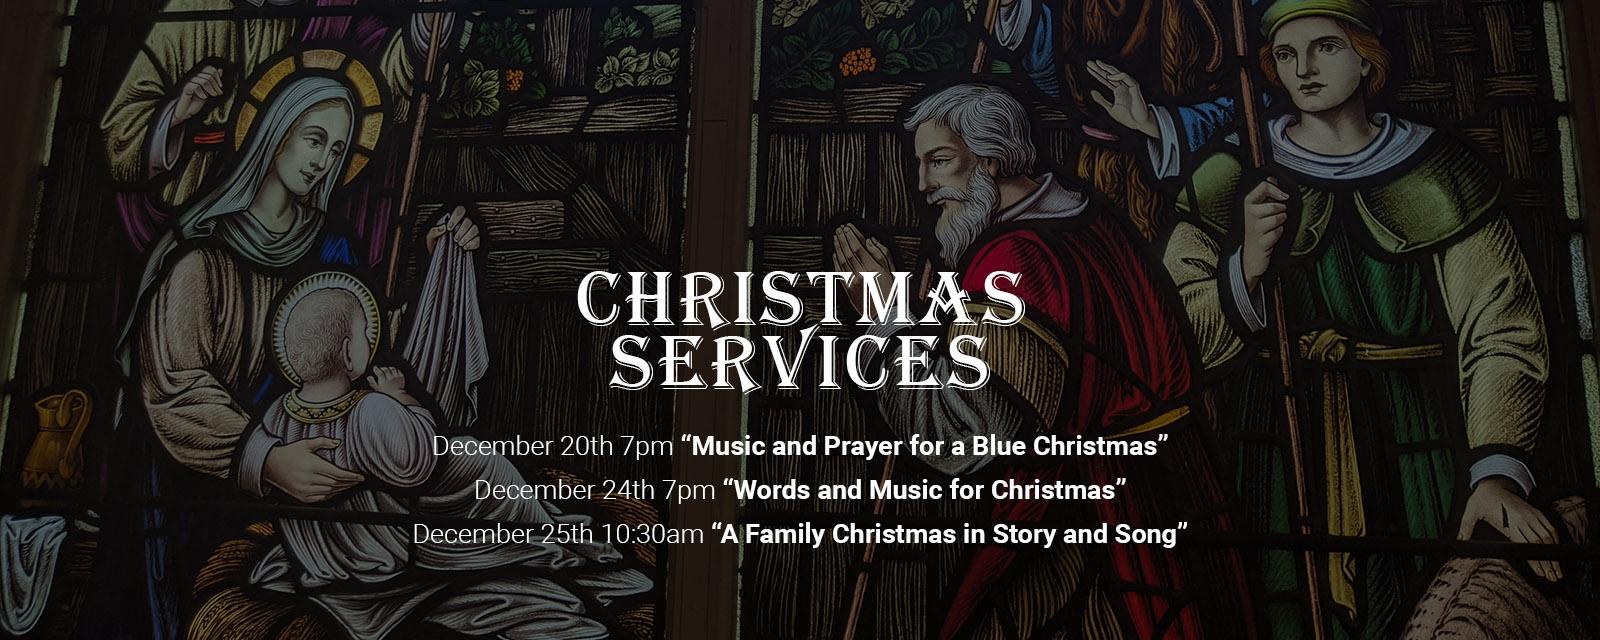 St Philip - Christmas